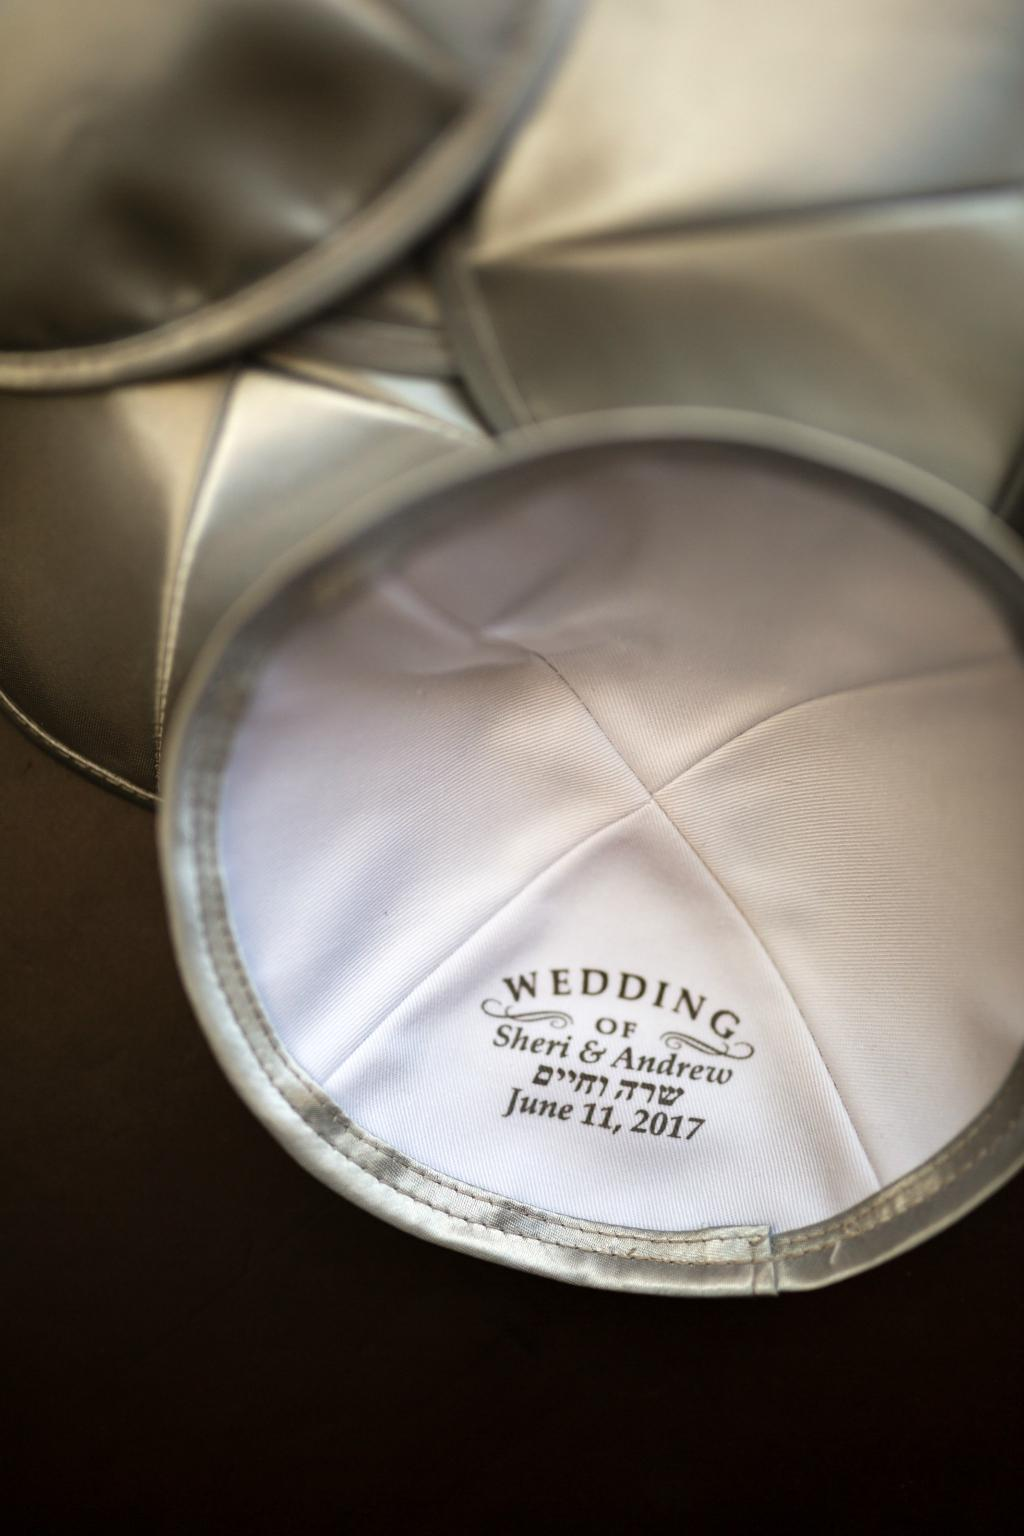 Africa Live this week: 7 - BBC News Rodeph shalom philadelphia wedding photos